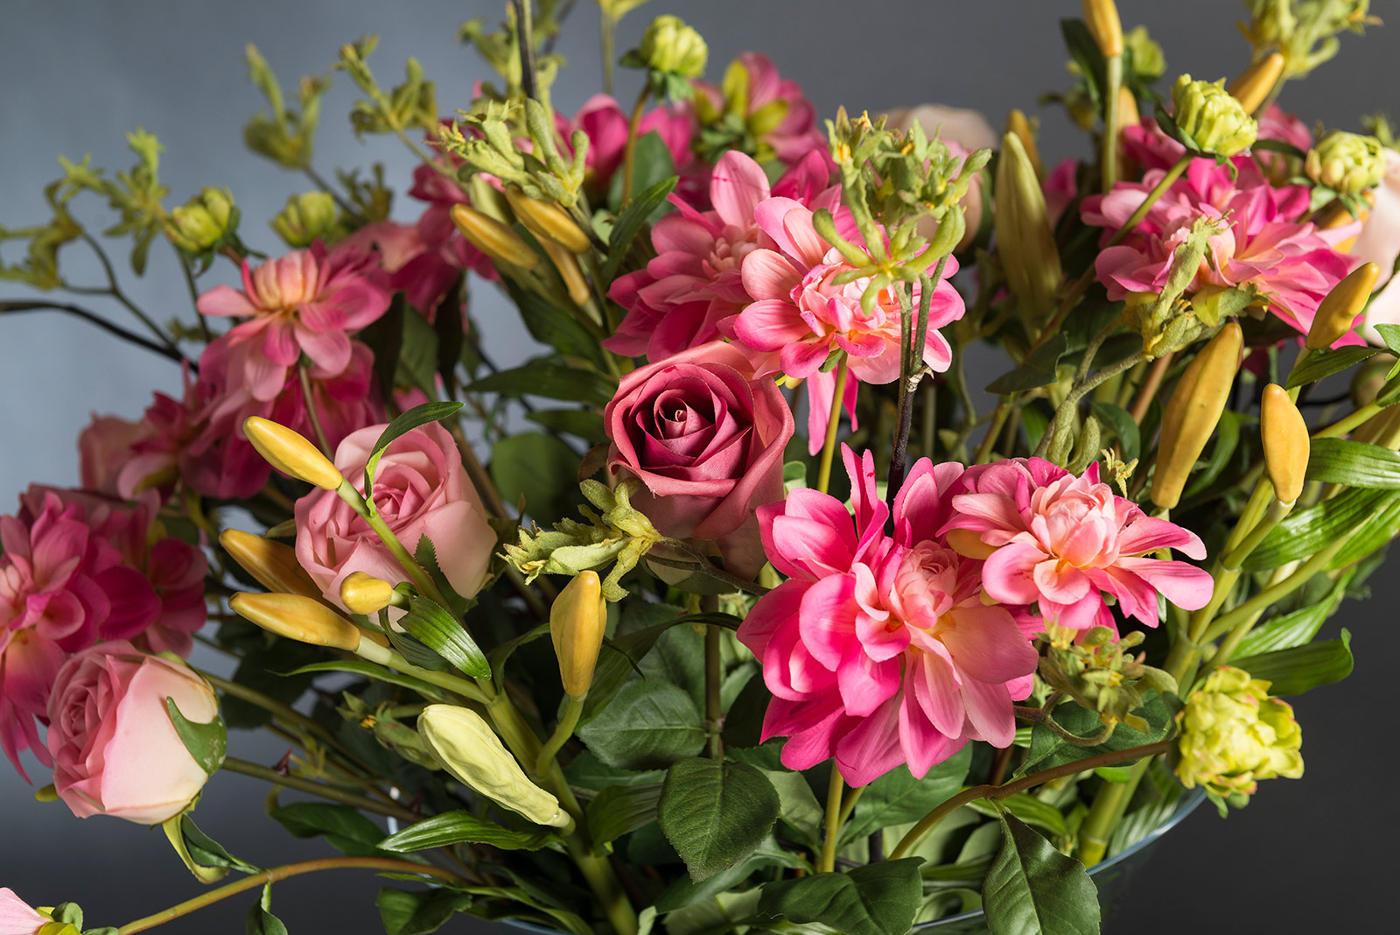 Ginevra flower bouquet by VG New Trend - Masha Shapiro Agency.jpg